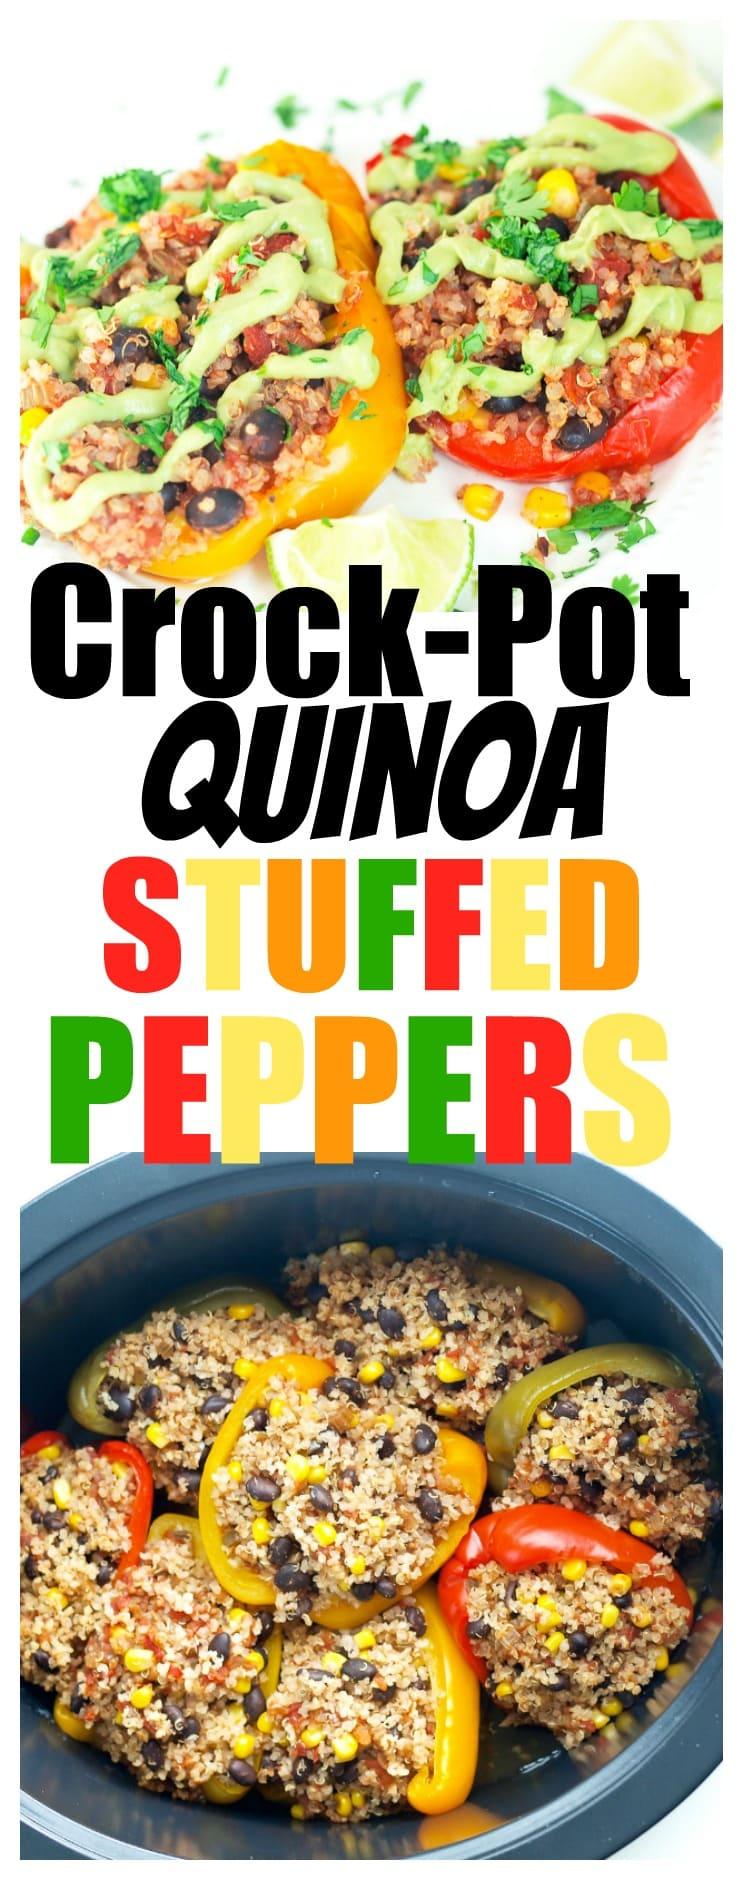 vegan | crockpot recipe | dinner | easy | healthy | quinoa | vegetarian